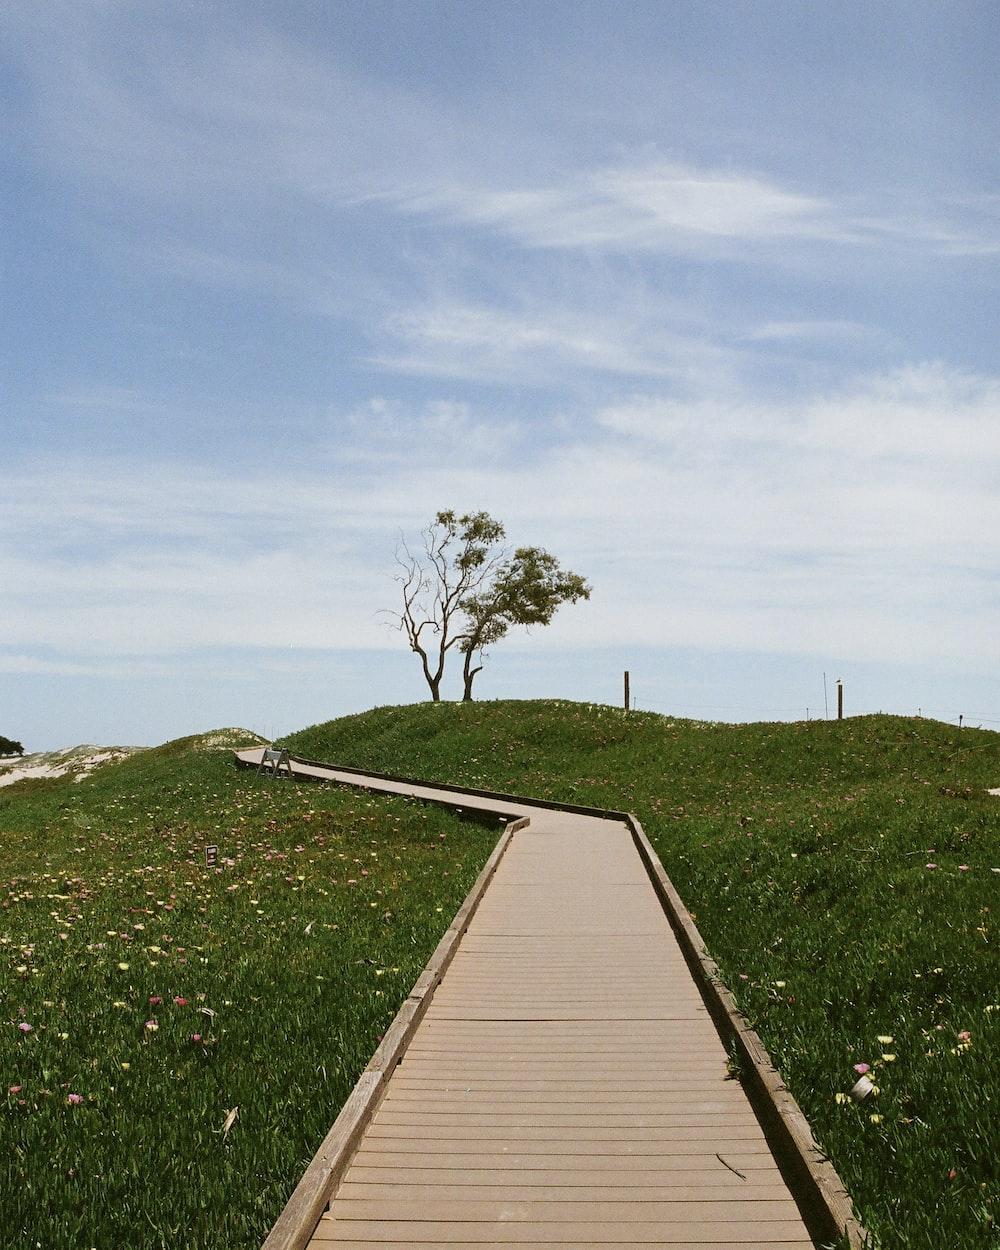 brown wooden dock on green grass field under blue sky during daytime